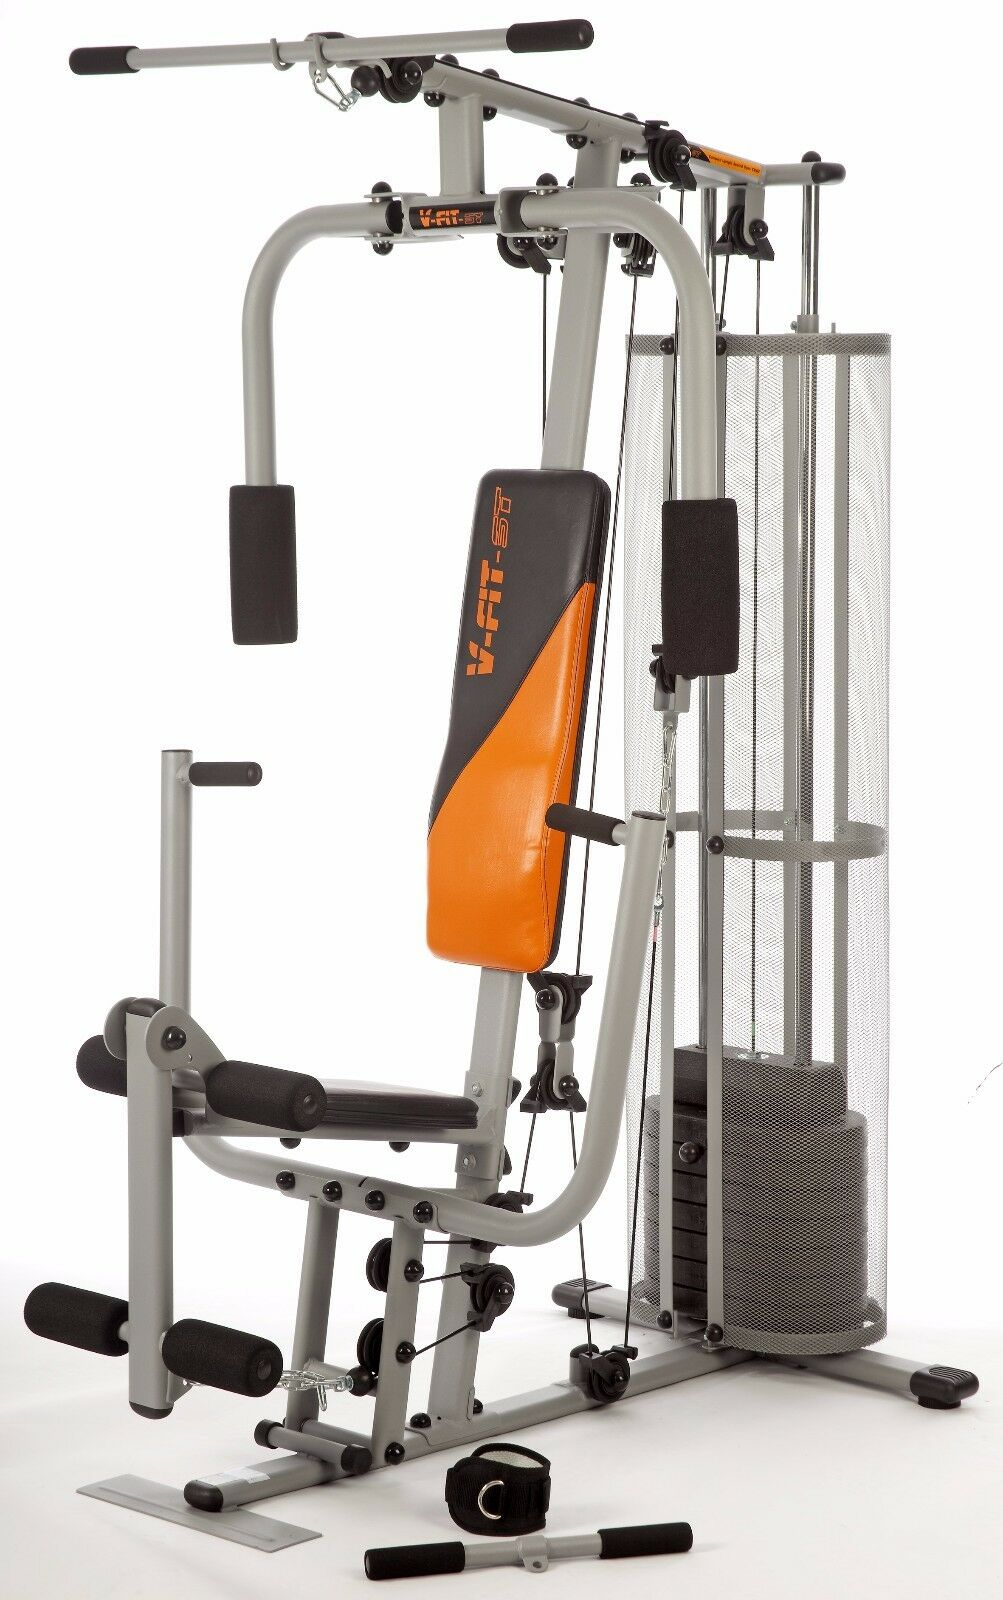 V Fit Herculean Cug2 Compact Upright Home Multi Gym 72kg R